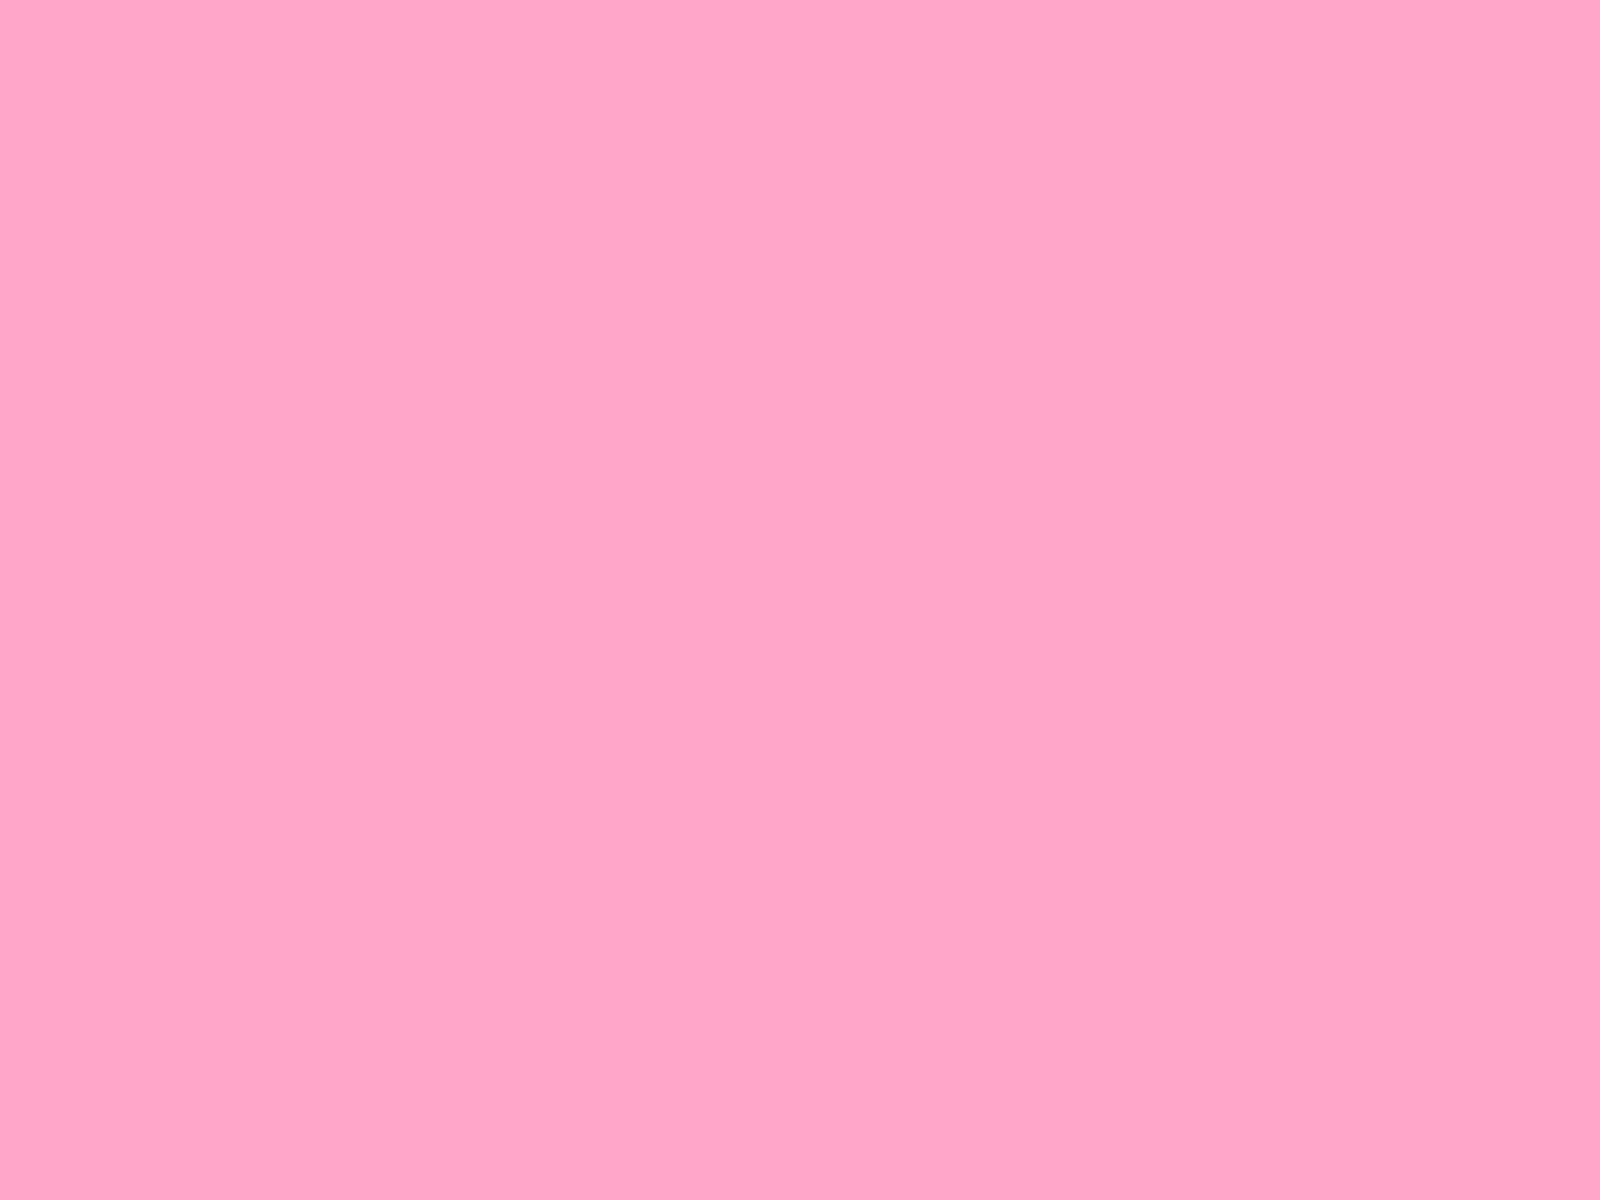 1600x1200 Carnation Pink Solid Color Background